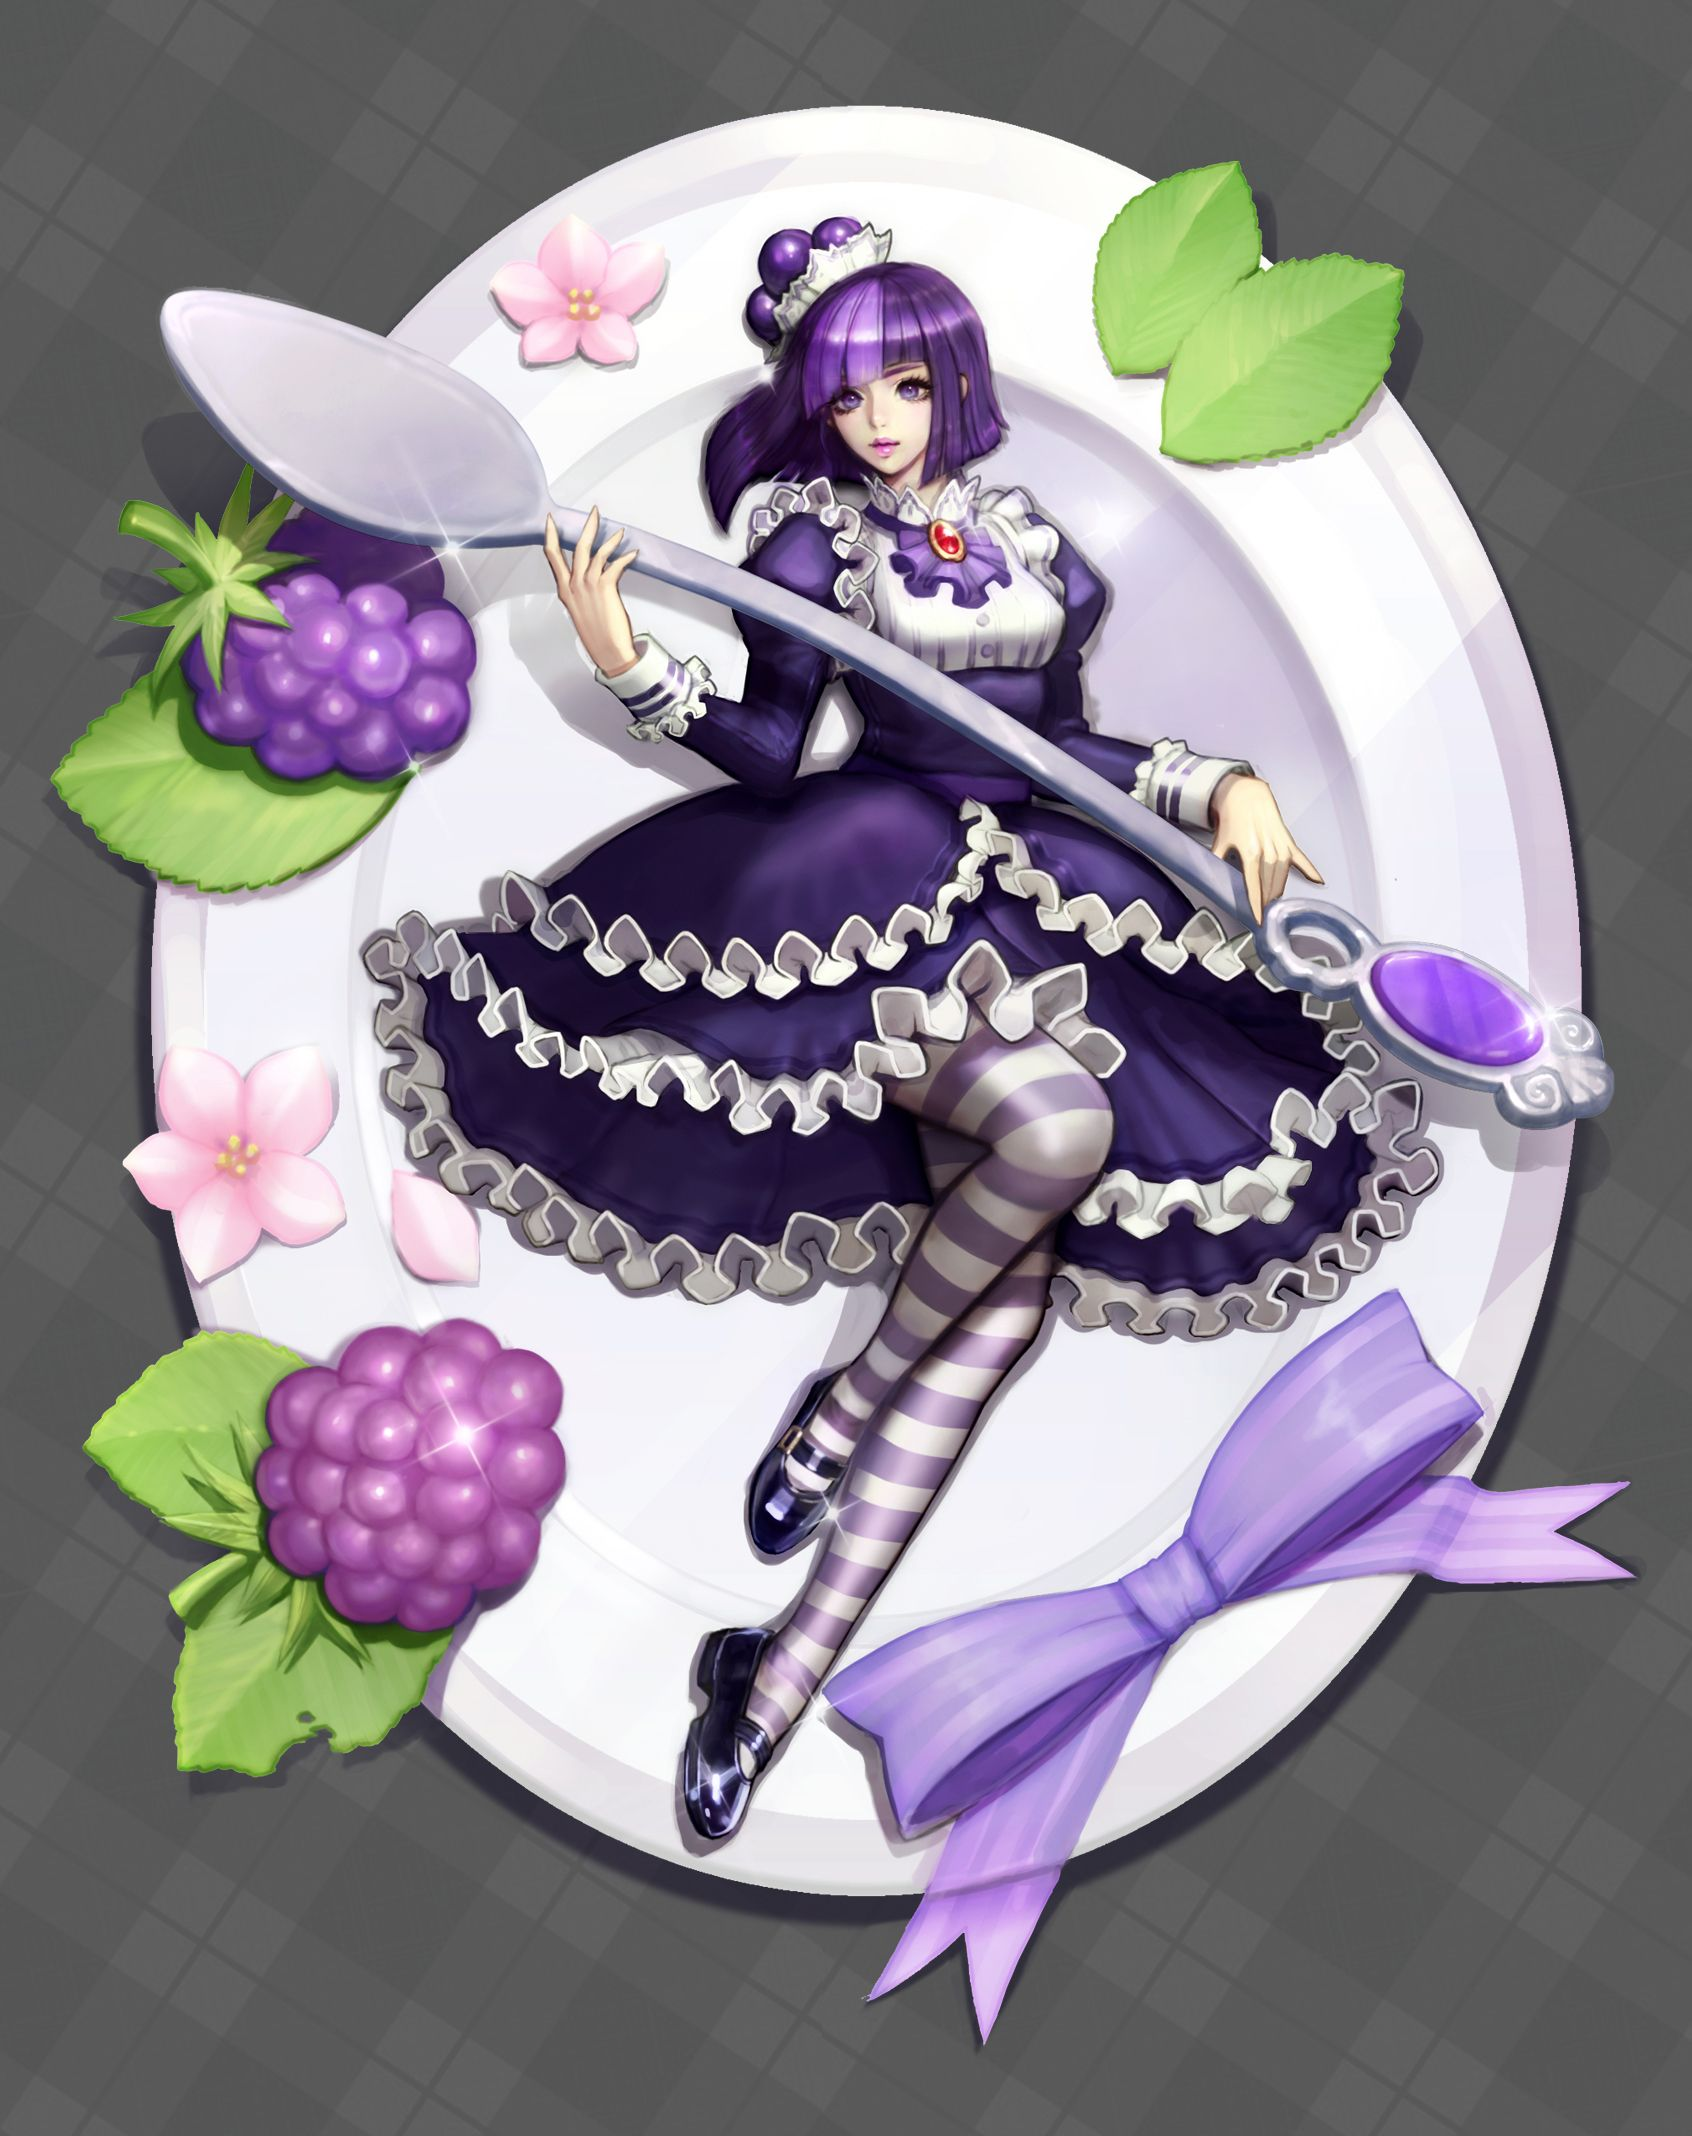 Pinterest In 2020 Cookie Run Blackberry Cookies Anime